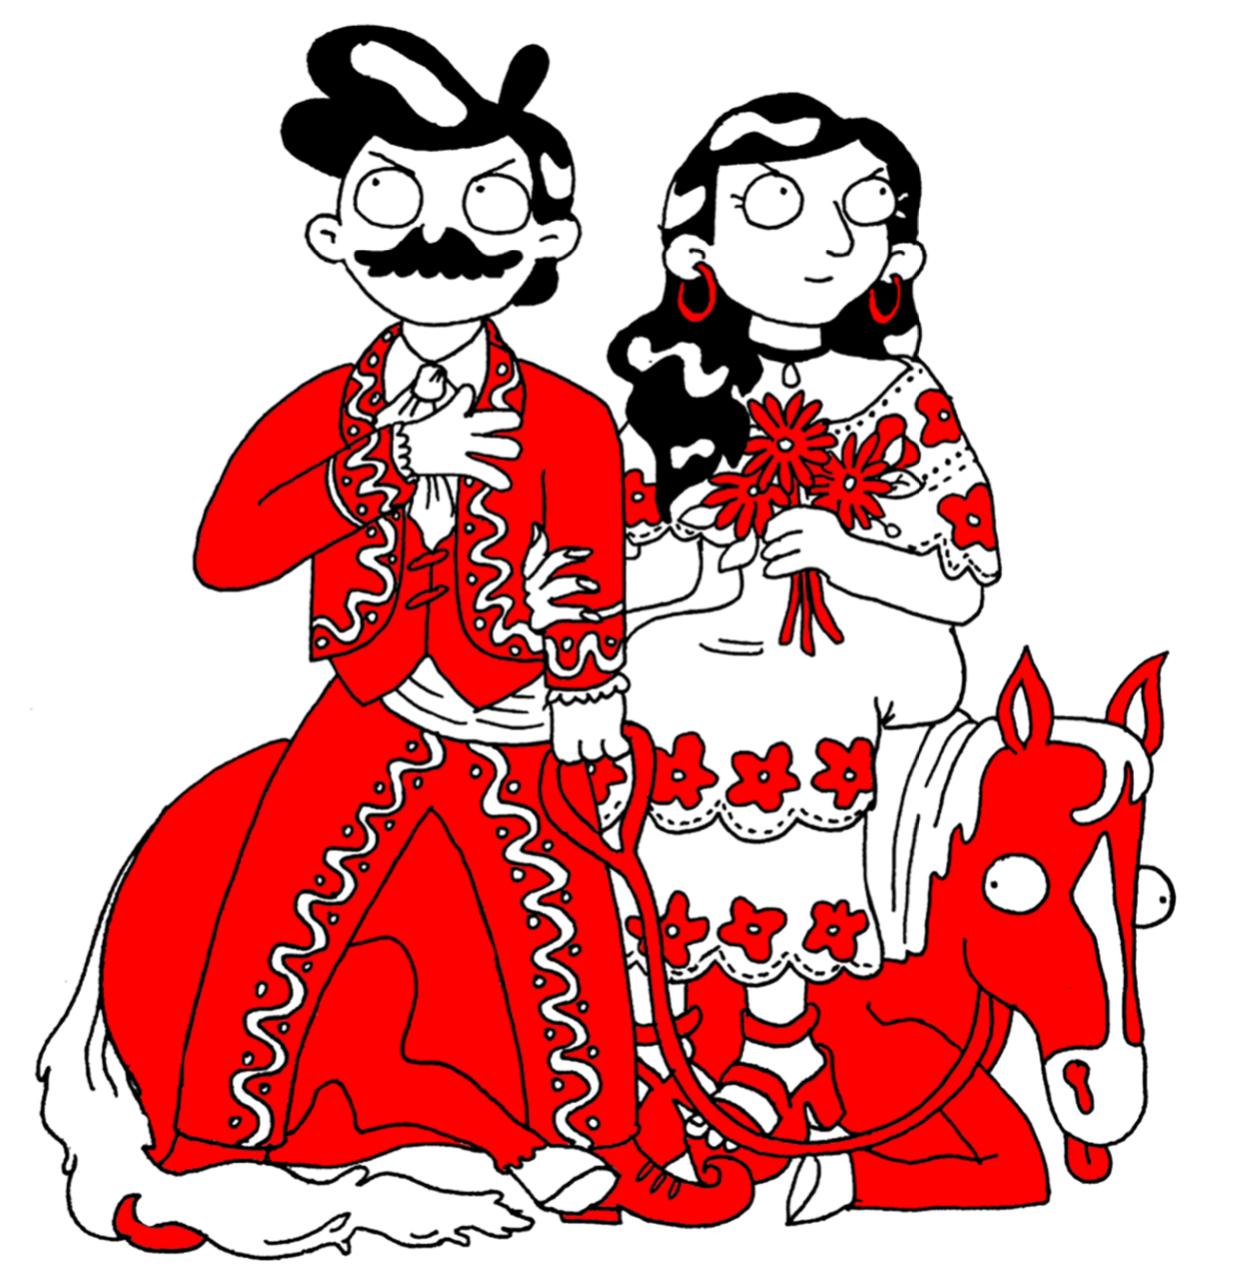 Promotional image for Tijuana Zine Fest